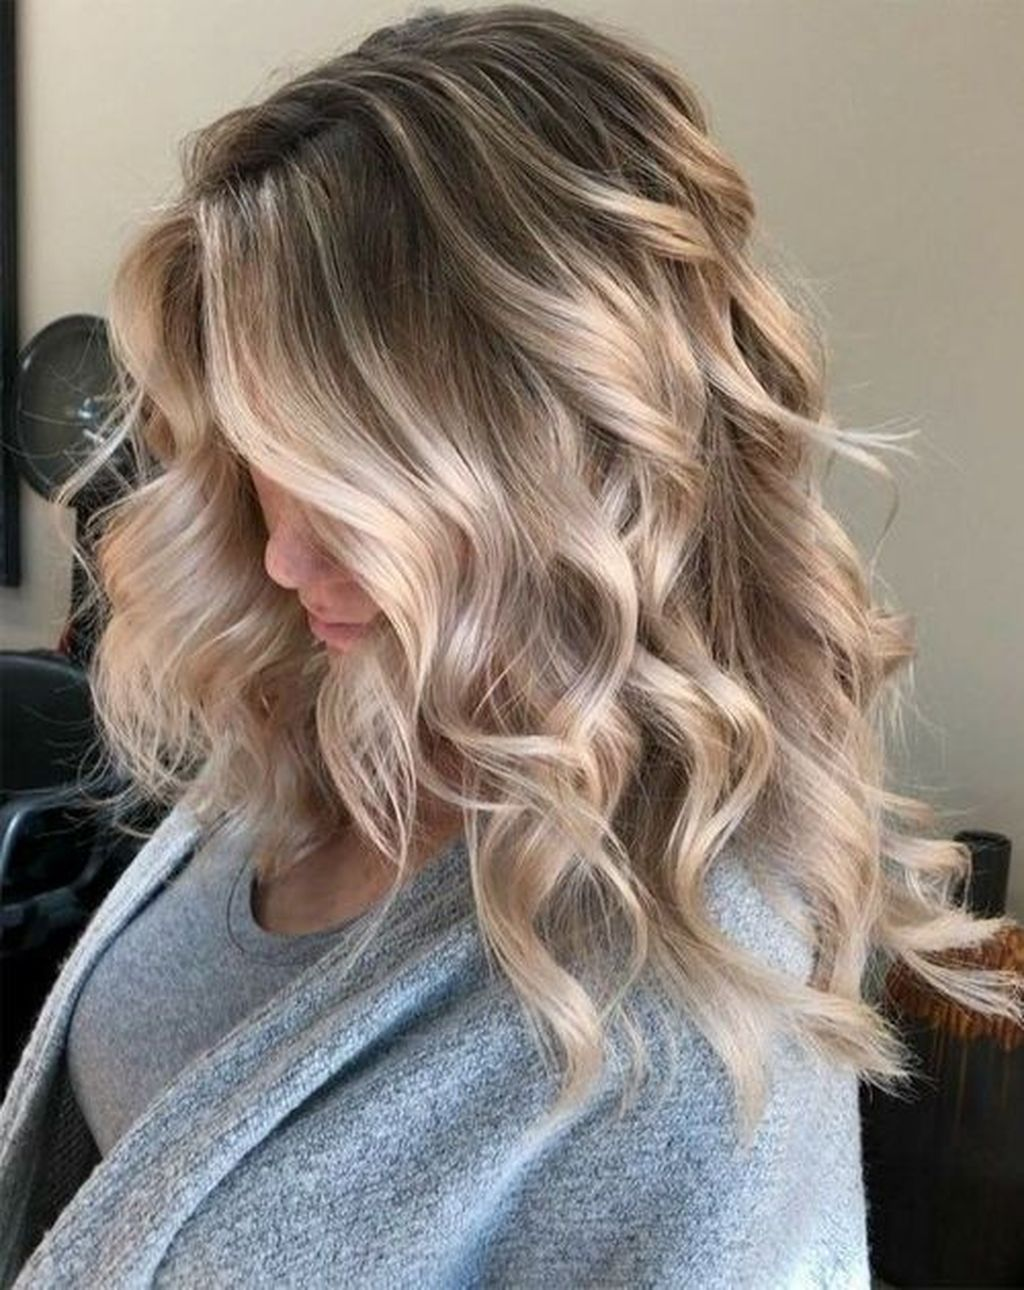 20+ Cute Medium Hairstyles Ideas For Girls | Blonde hair with ...